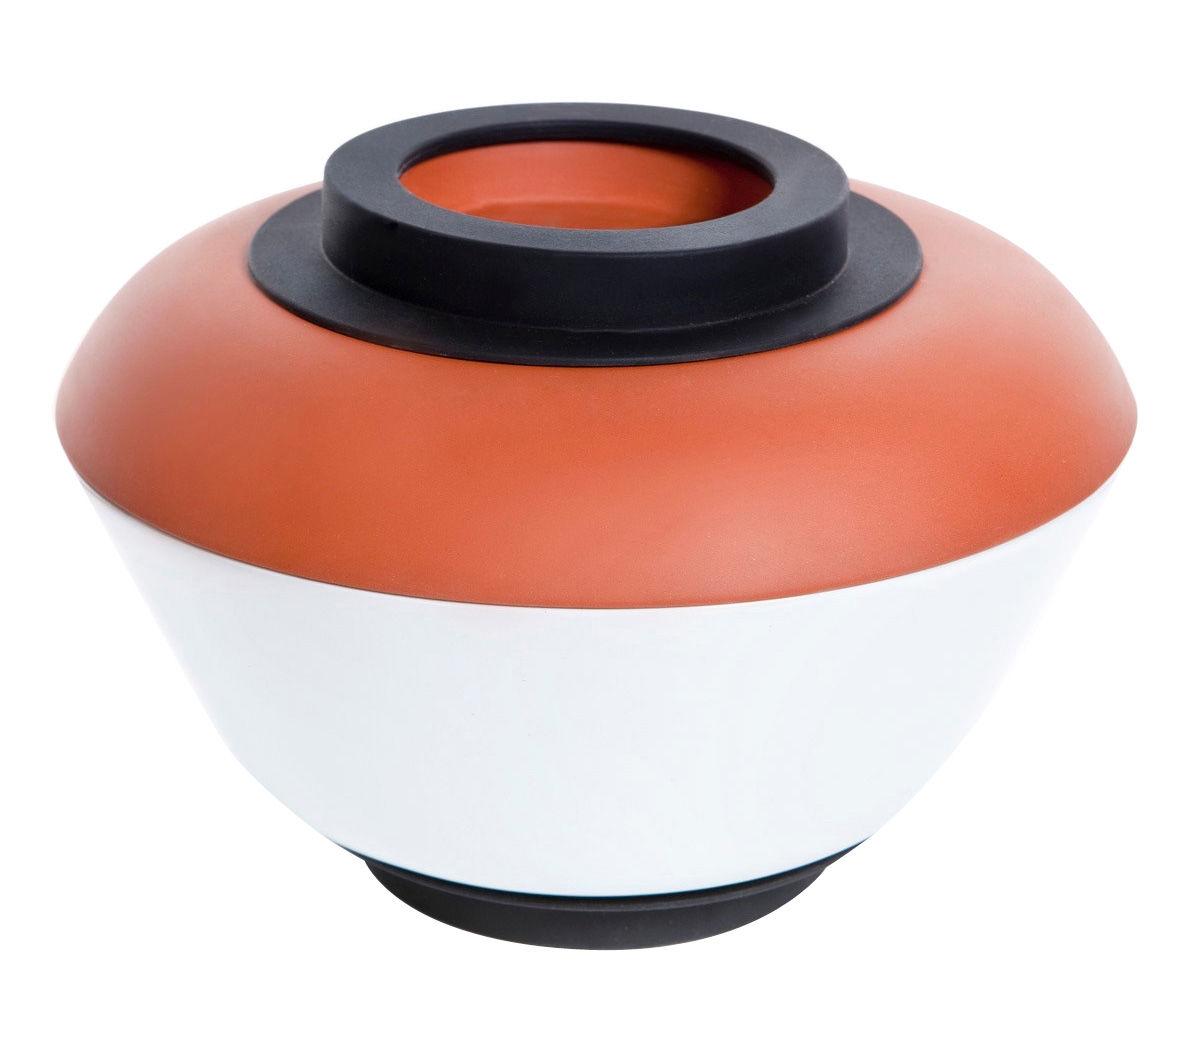 slowcooker xl tagine dish terracotta by royal vkb. Black Bedroom Furniture Sets. Home Design Ideas